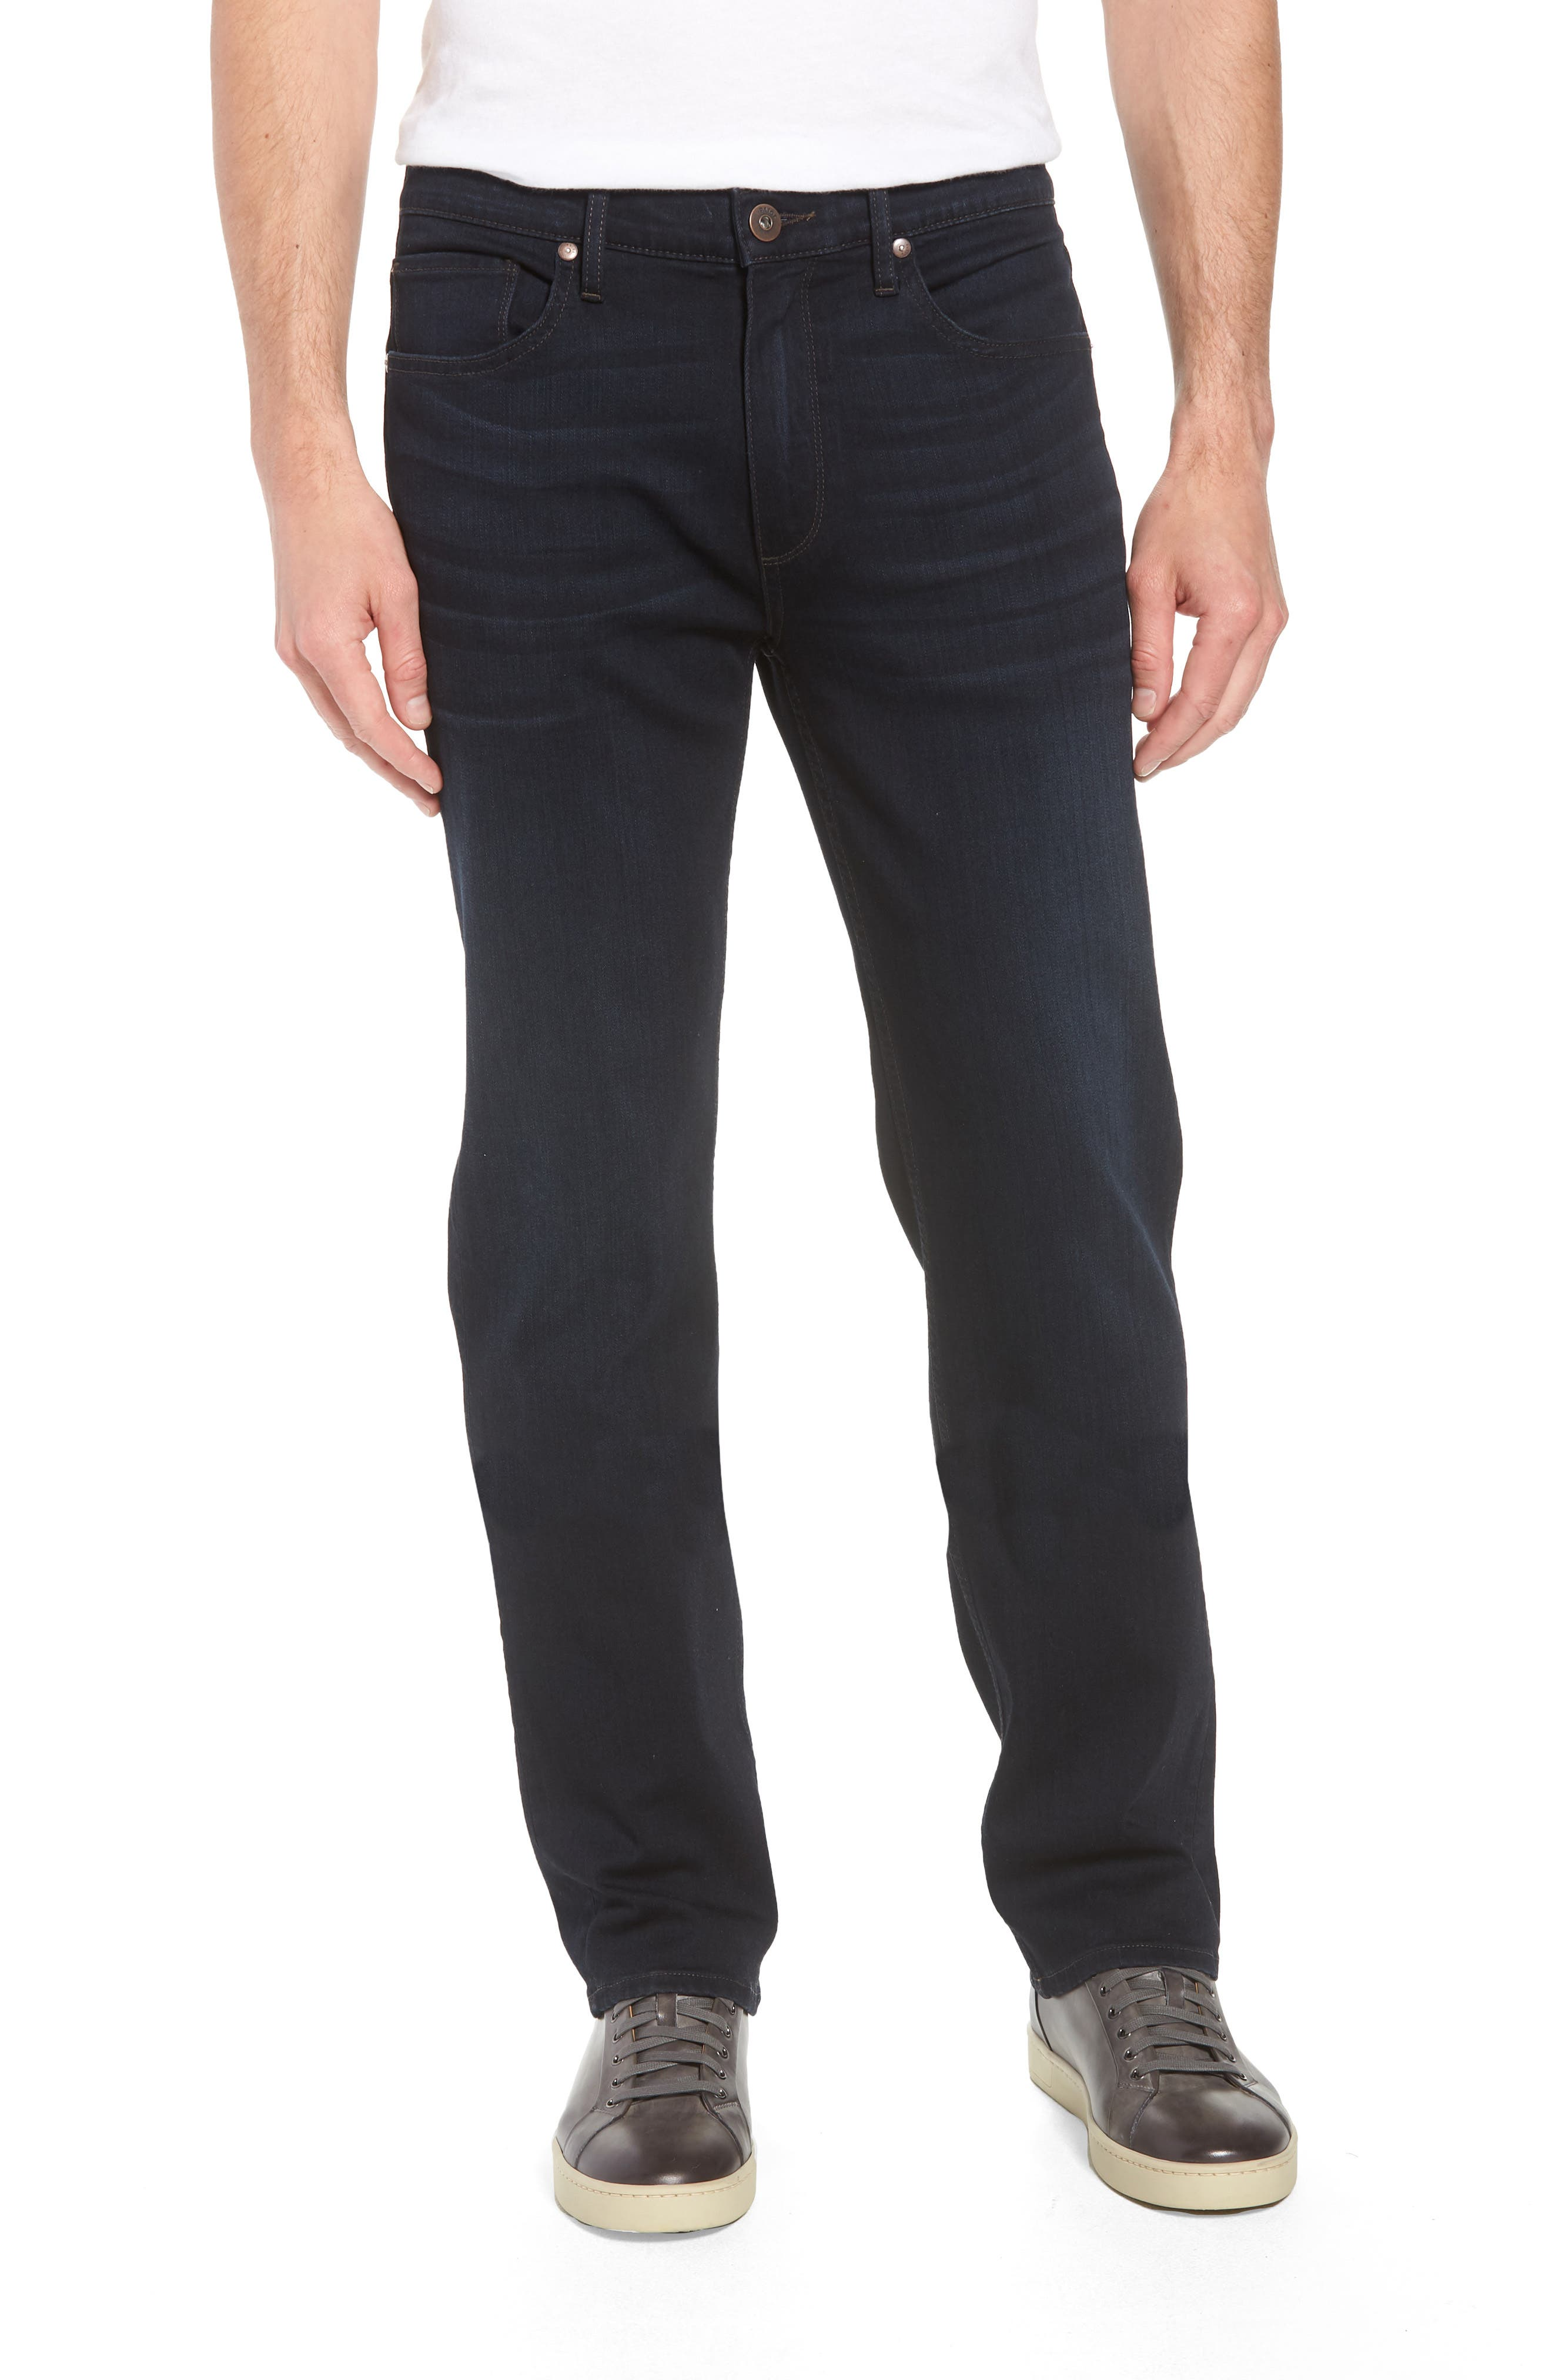 Normandie Straight Leg Jeans,                             Main thumbnail 1, color,                             FLEET